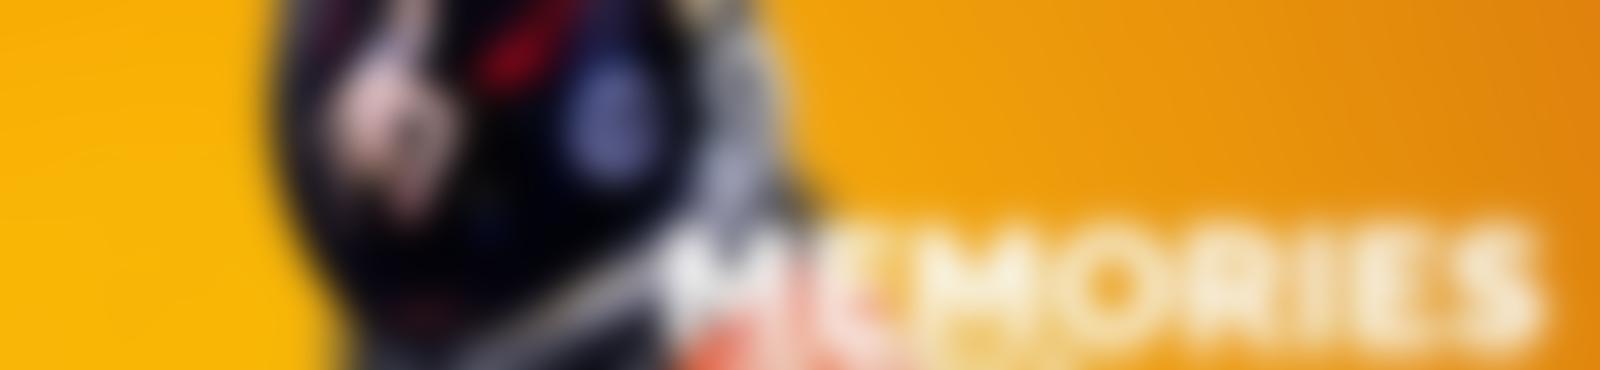 Blurred 7184cb91 6422 4e81 b674 59d8b0b4eabc